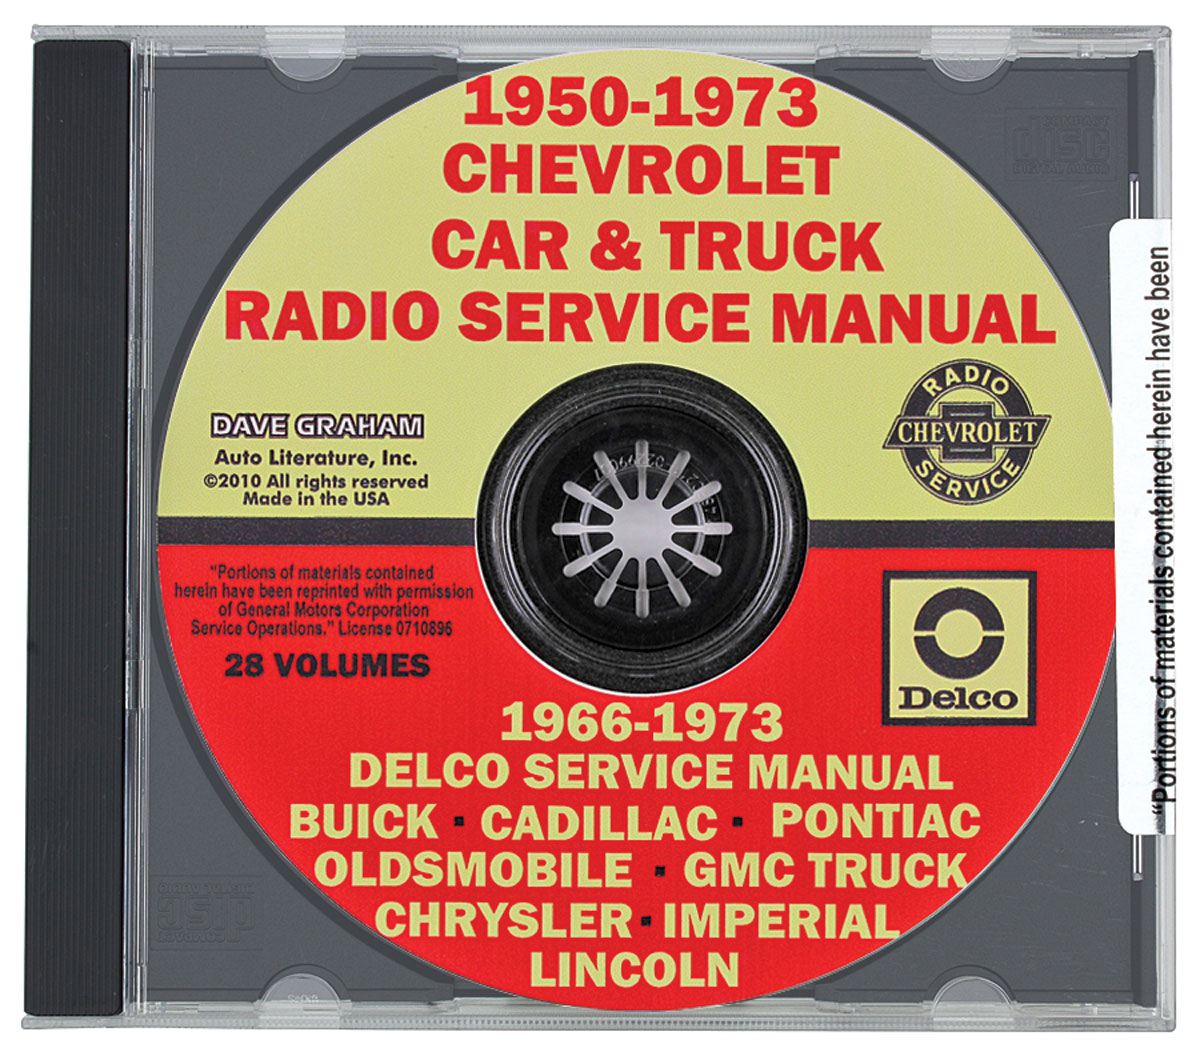 CD-ROM Radio Service Manual, GM